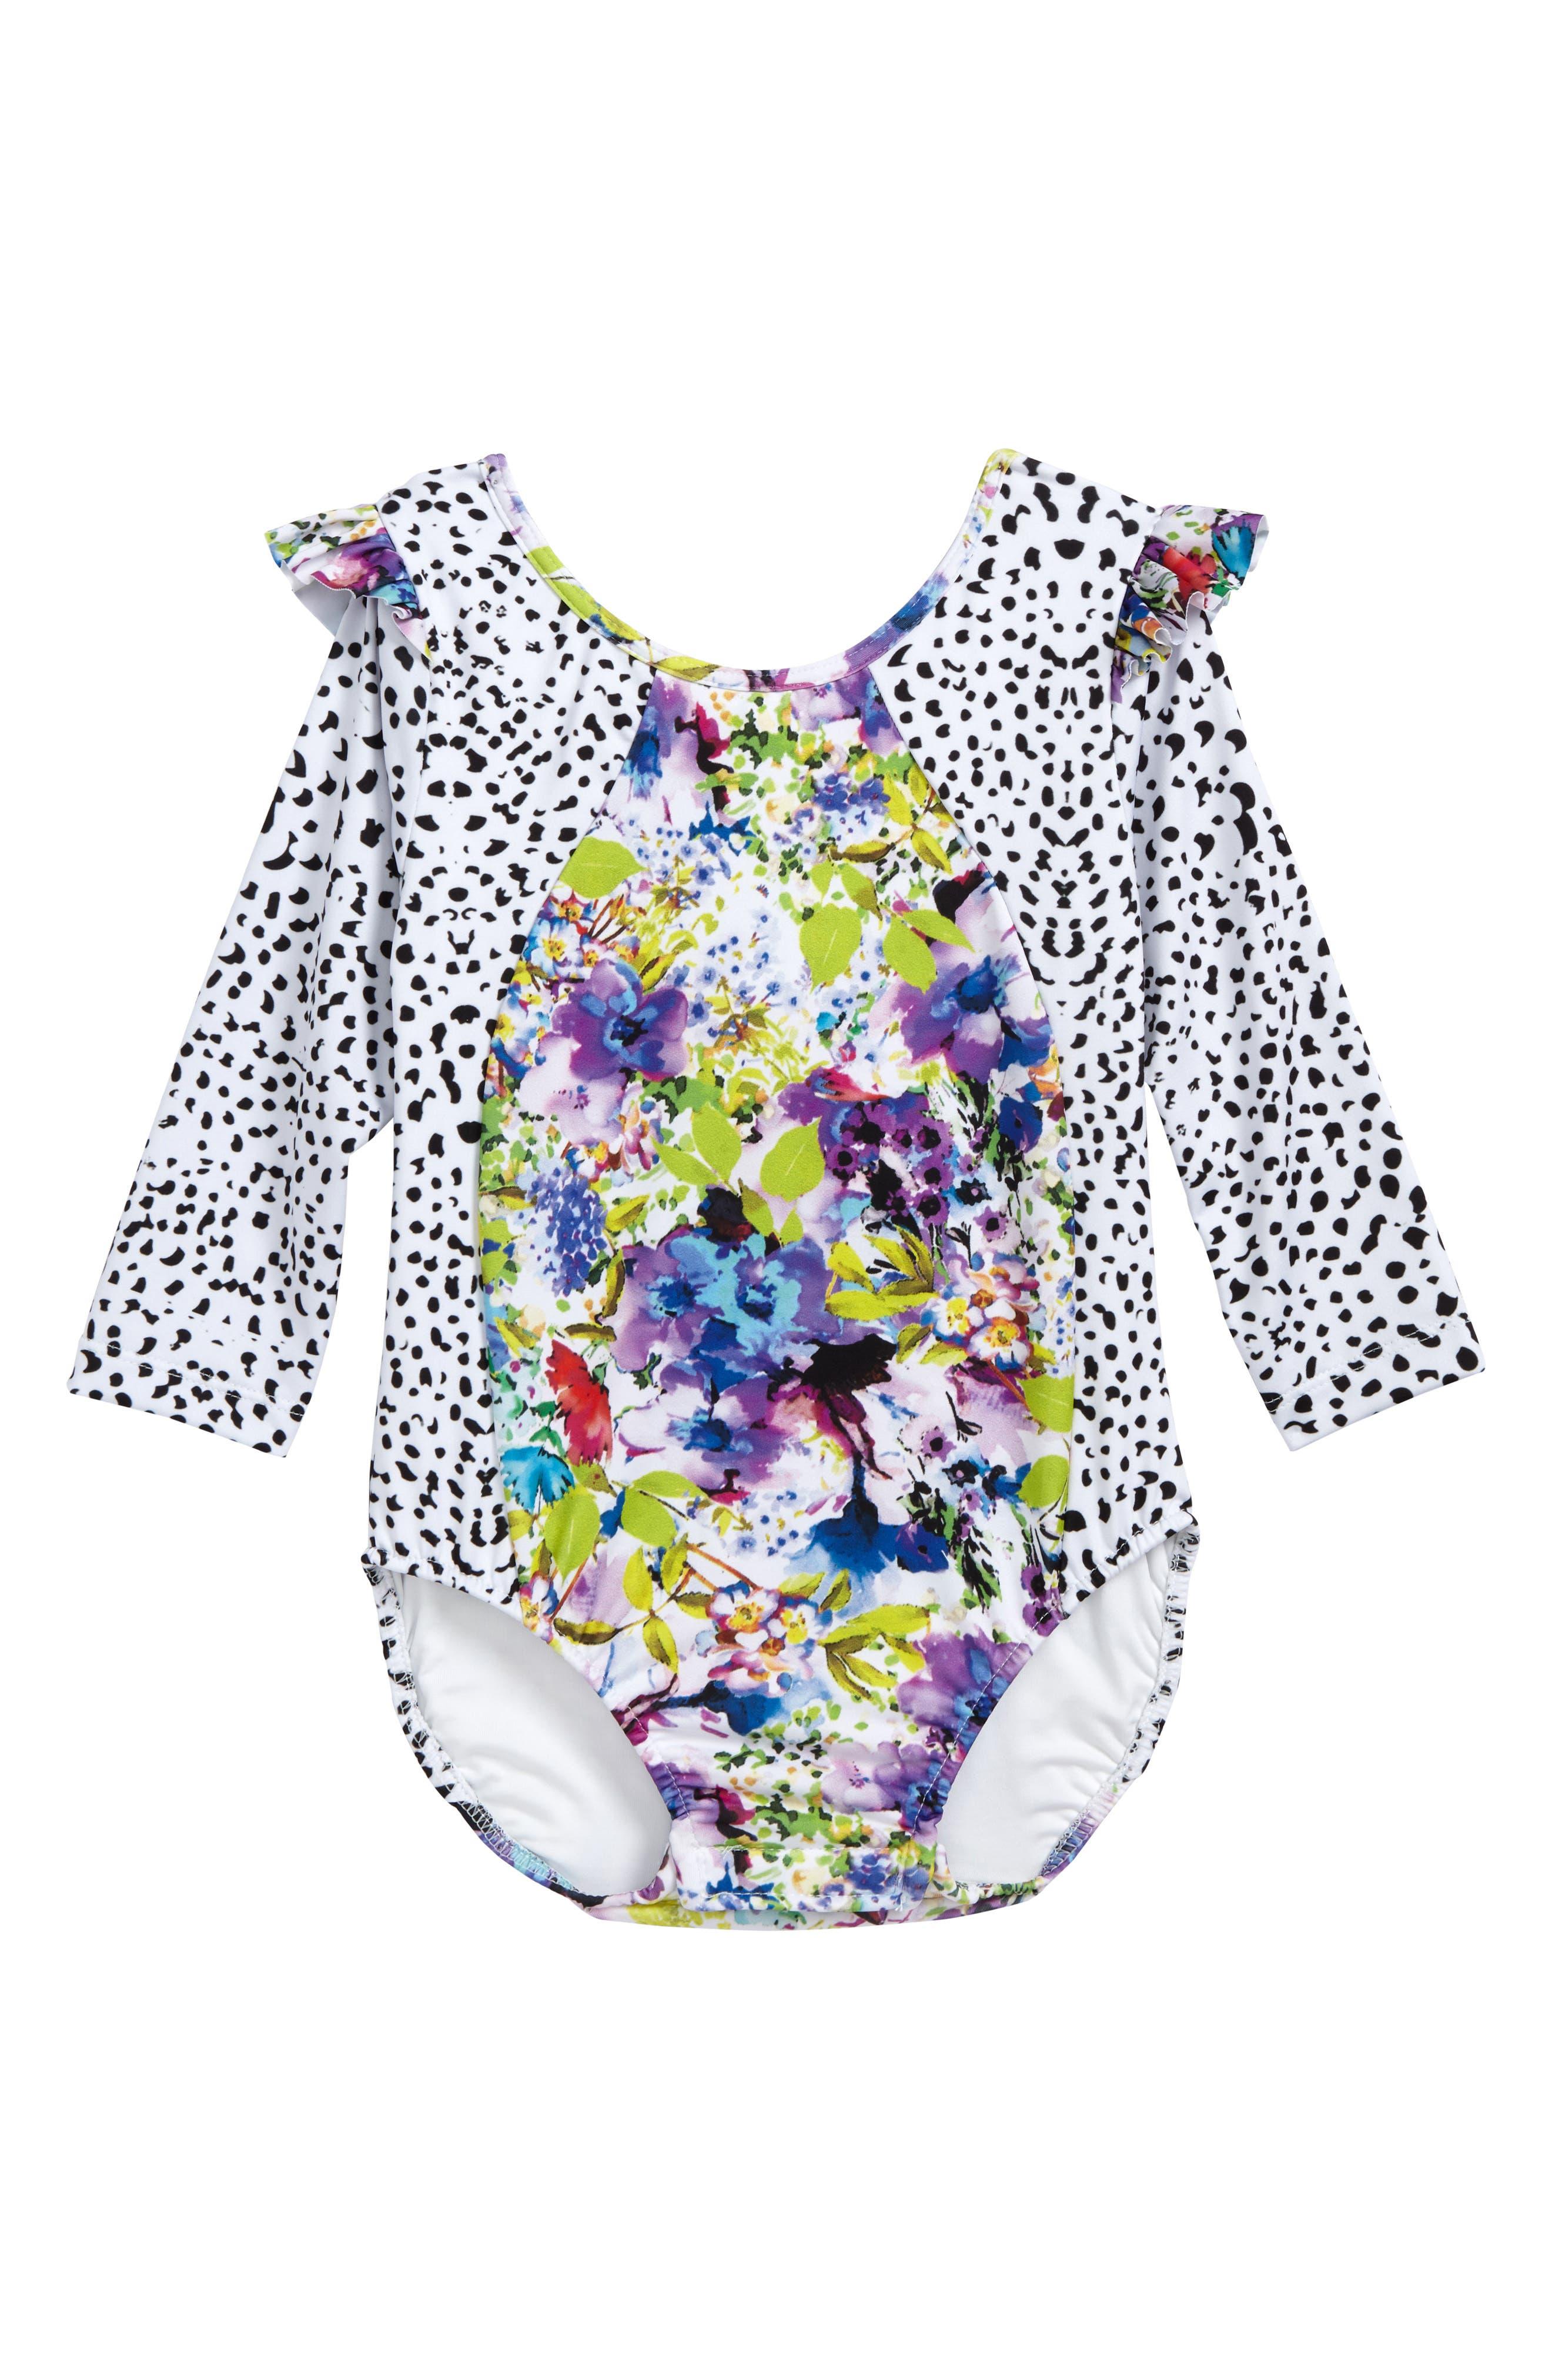 Main Image - The Salty Baby One-Piece Rashguard Swimsuit (Toddler Girls)